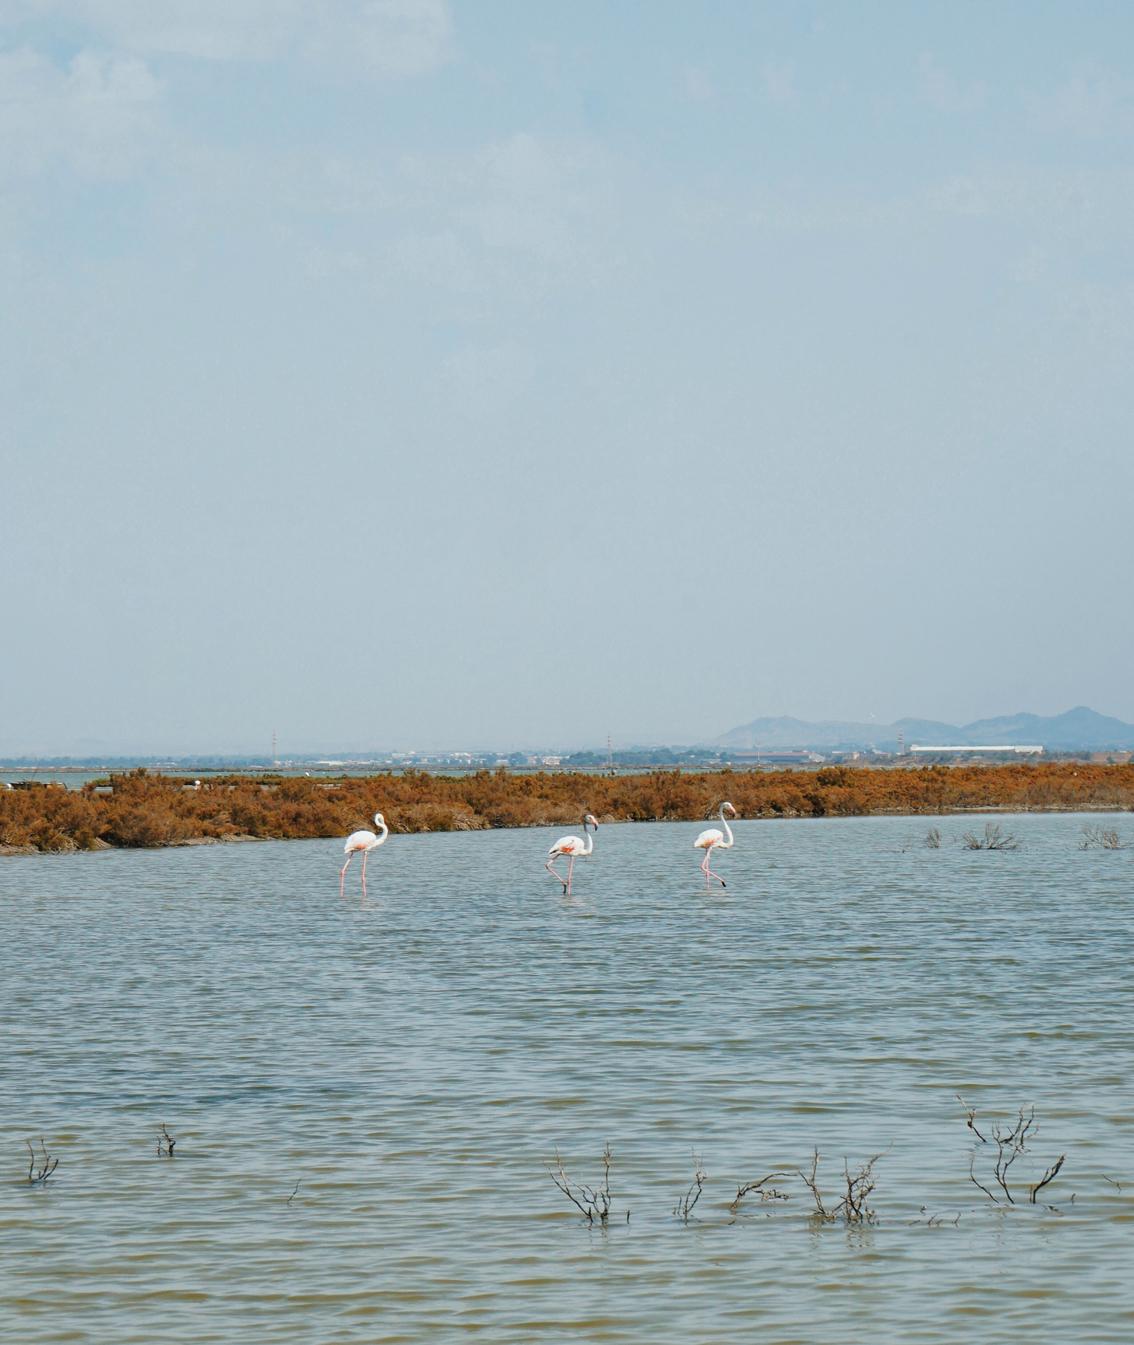 8 2 days in Cagliari ( Sardinia ), where to sleep to discover the best beaches.